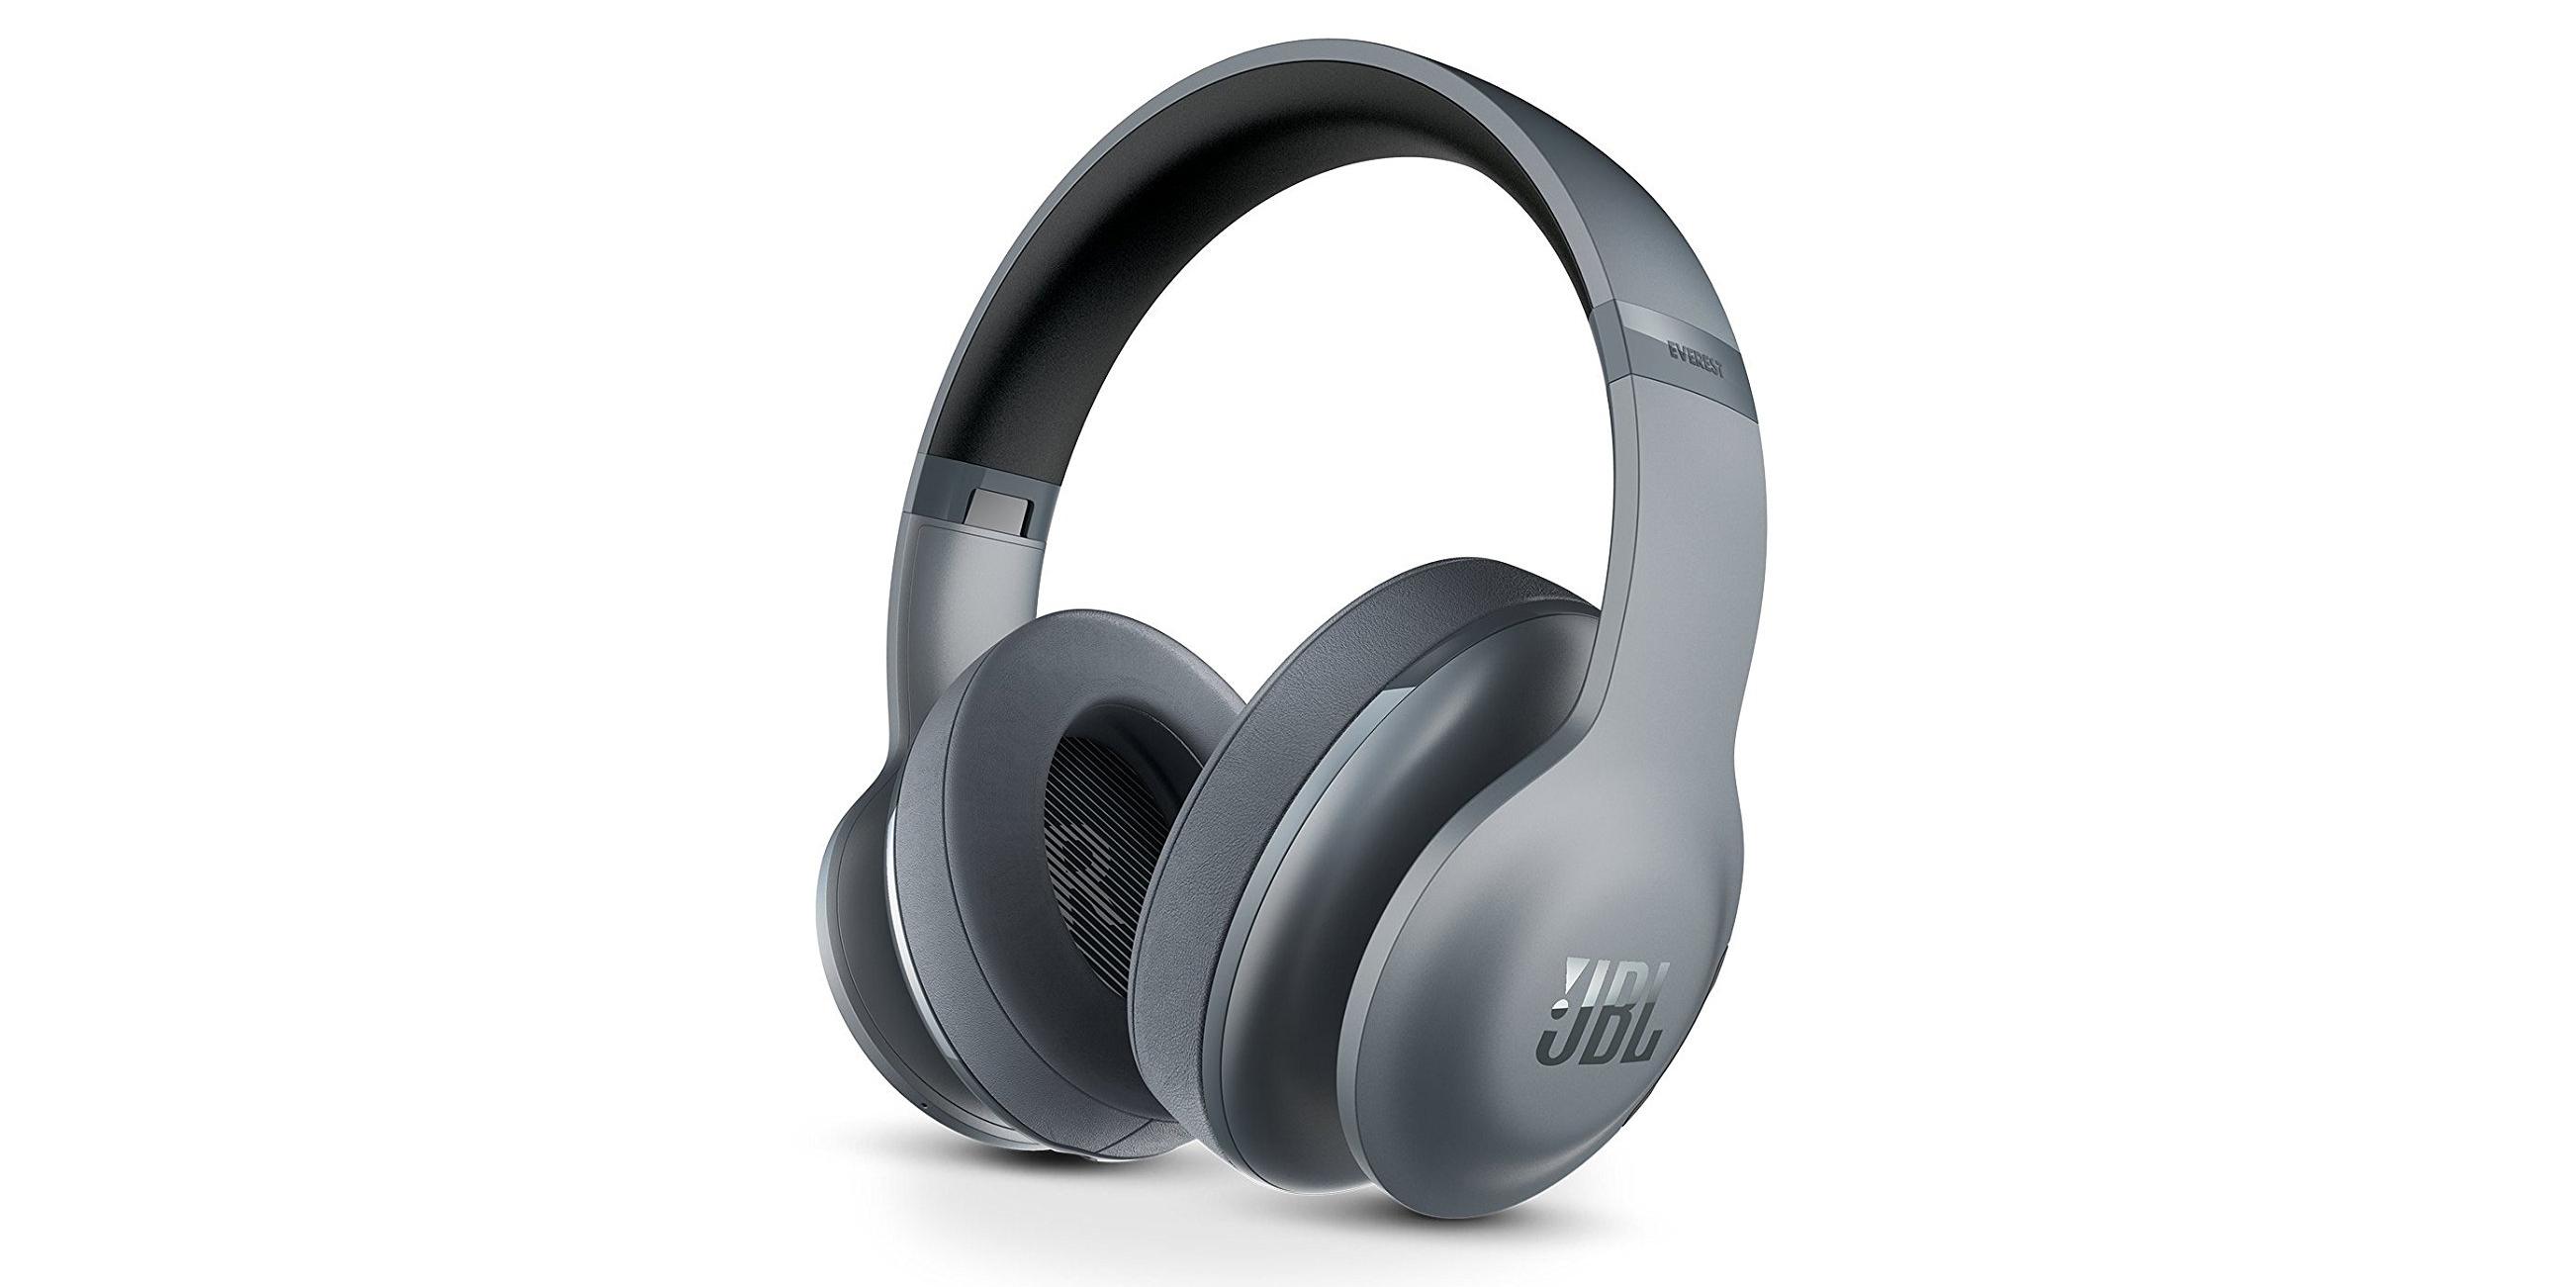 JBL's Everest 700 Bluetooth Headphones hit $60 bundled w/ $5 GC (Refurb, Orig. $200)